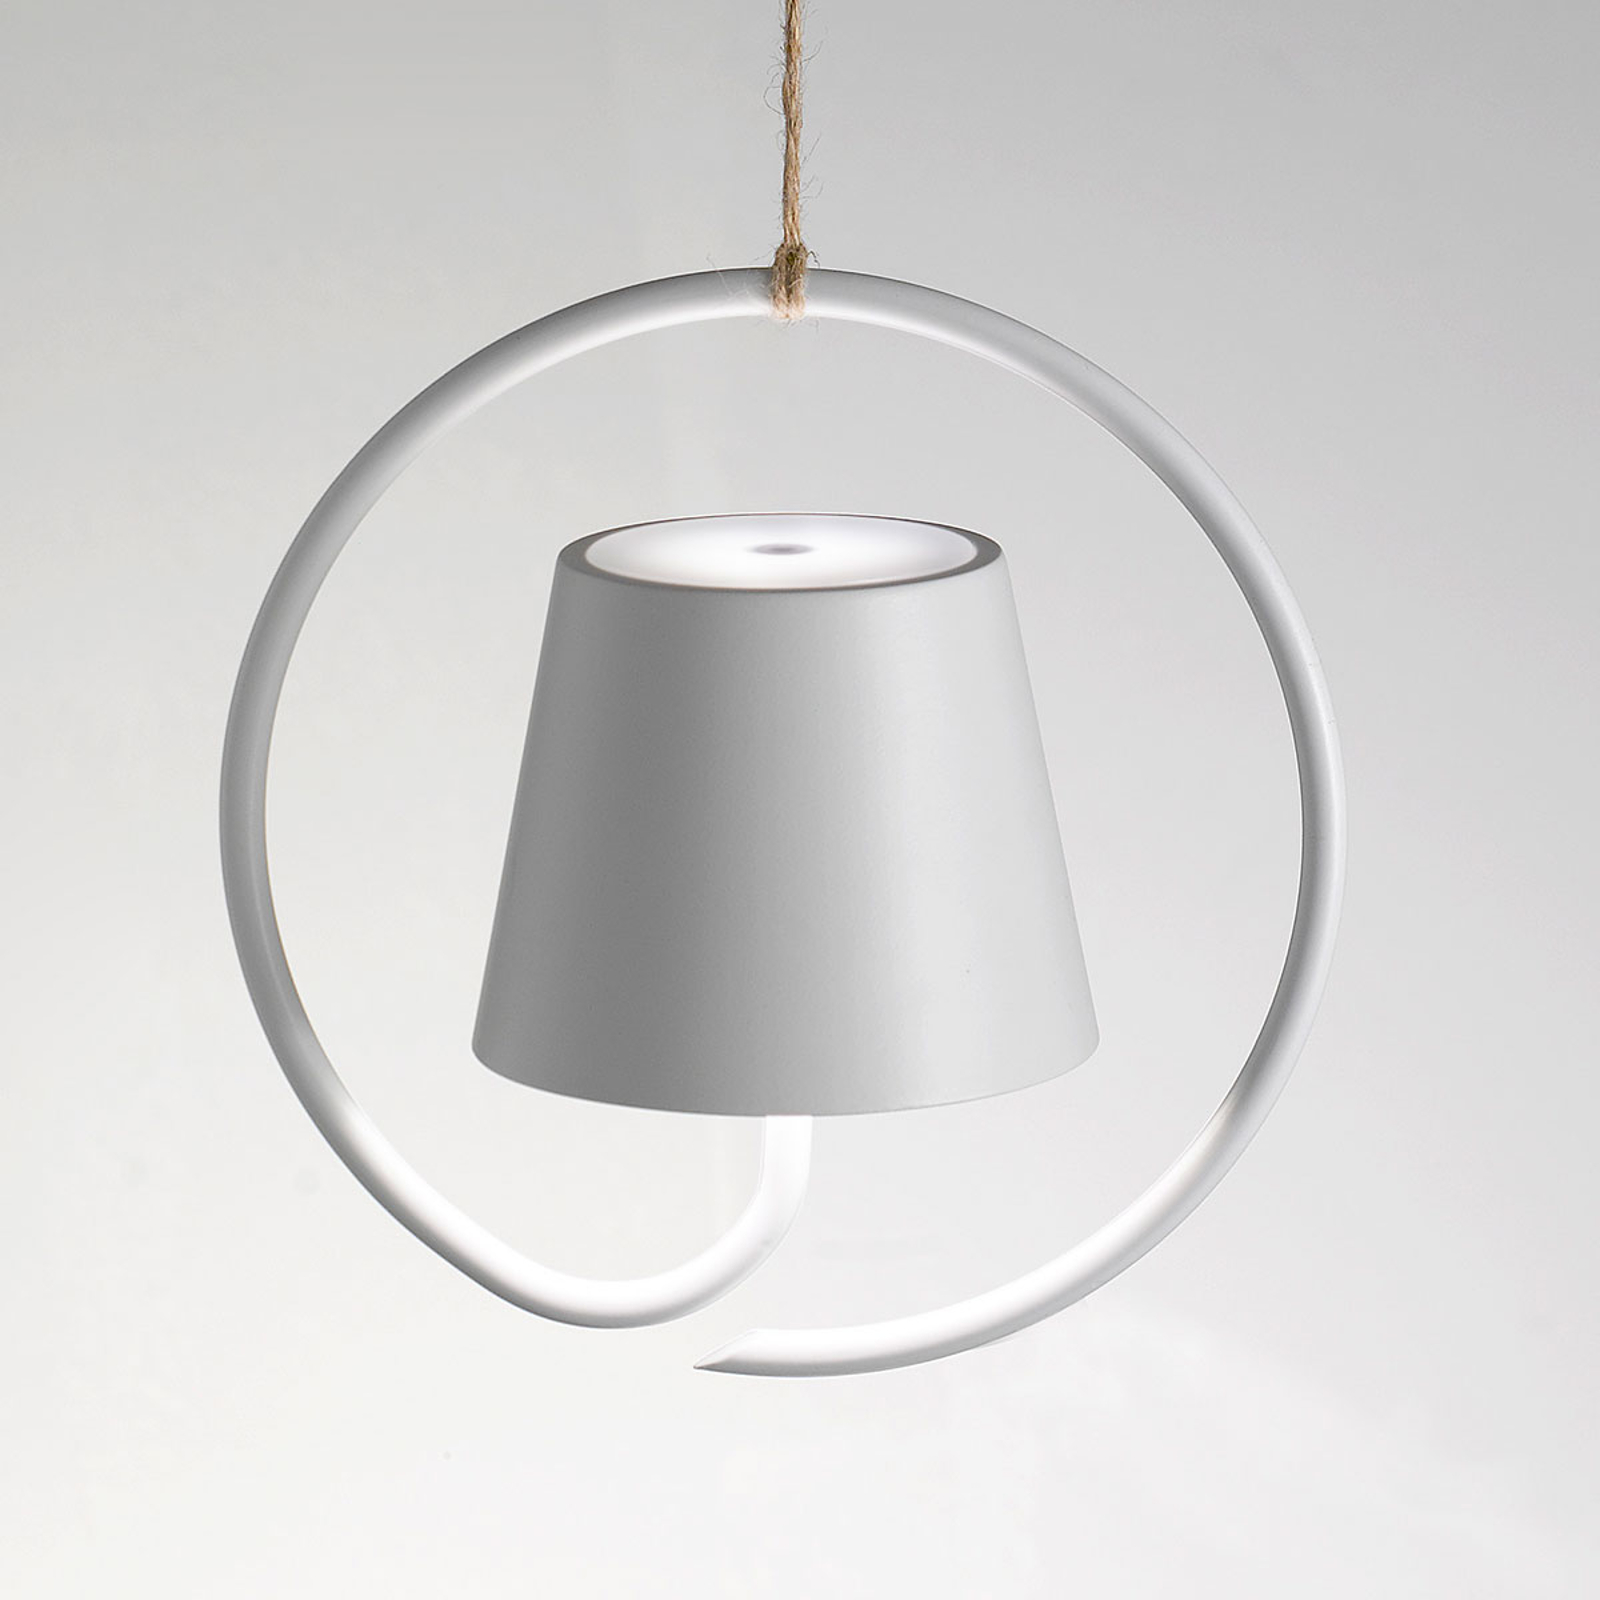 Lampa wisząca LED Poldina, akumulator, biała